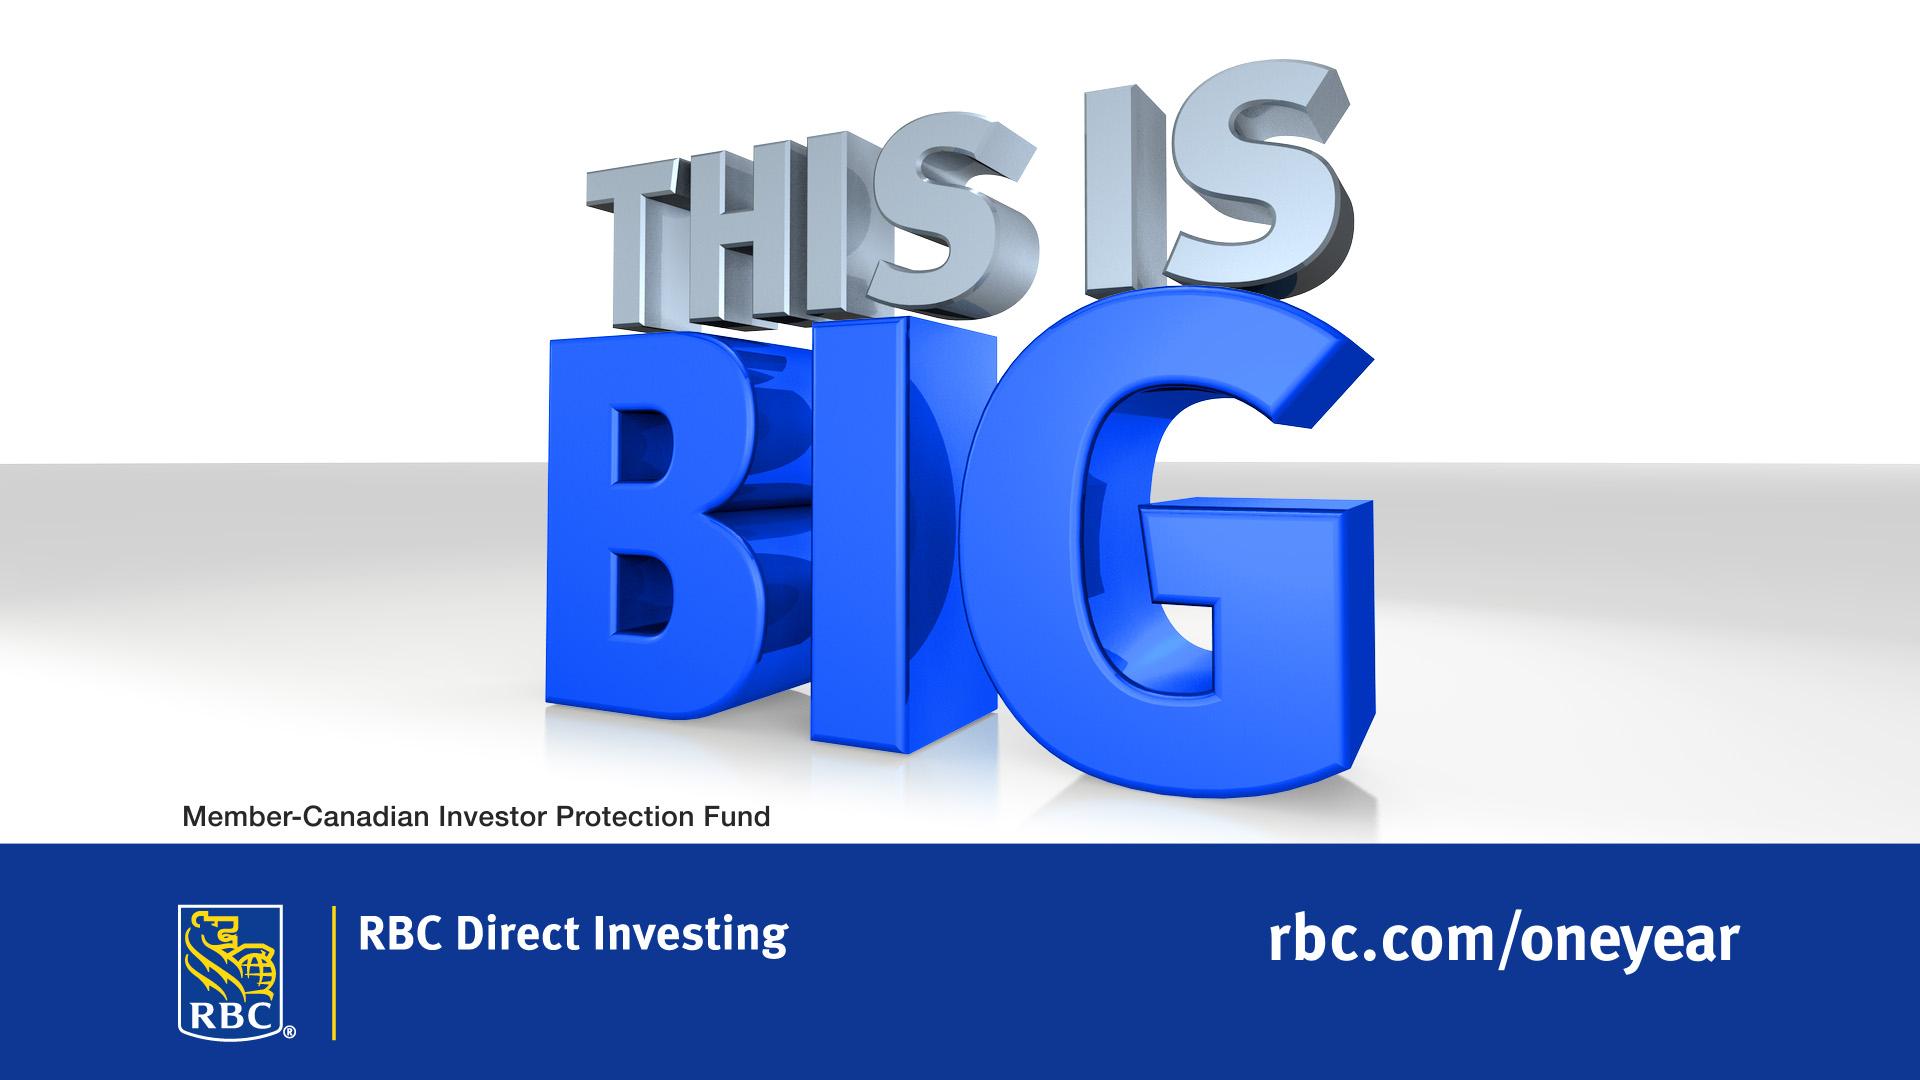 rbc_directinvesting_image01